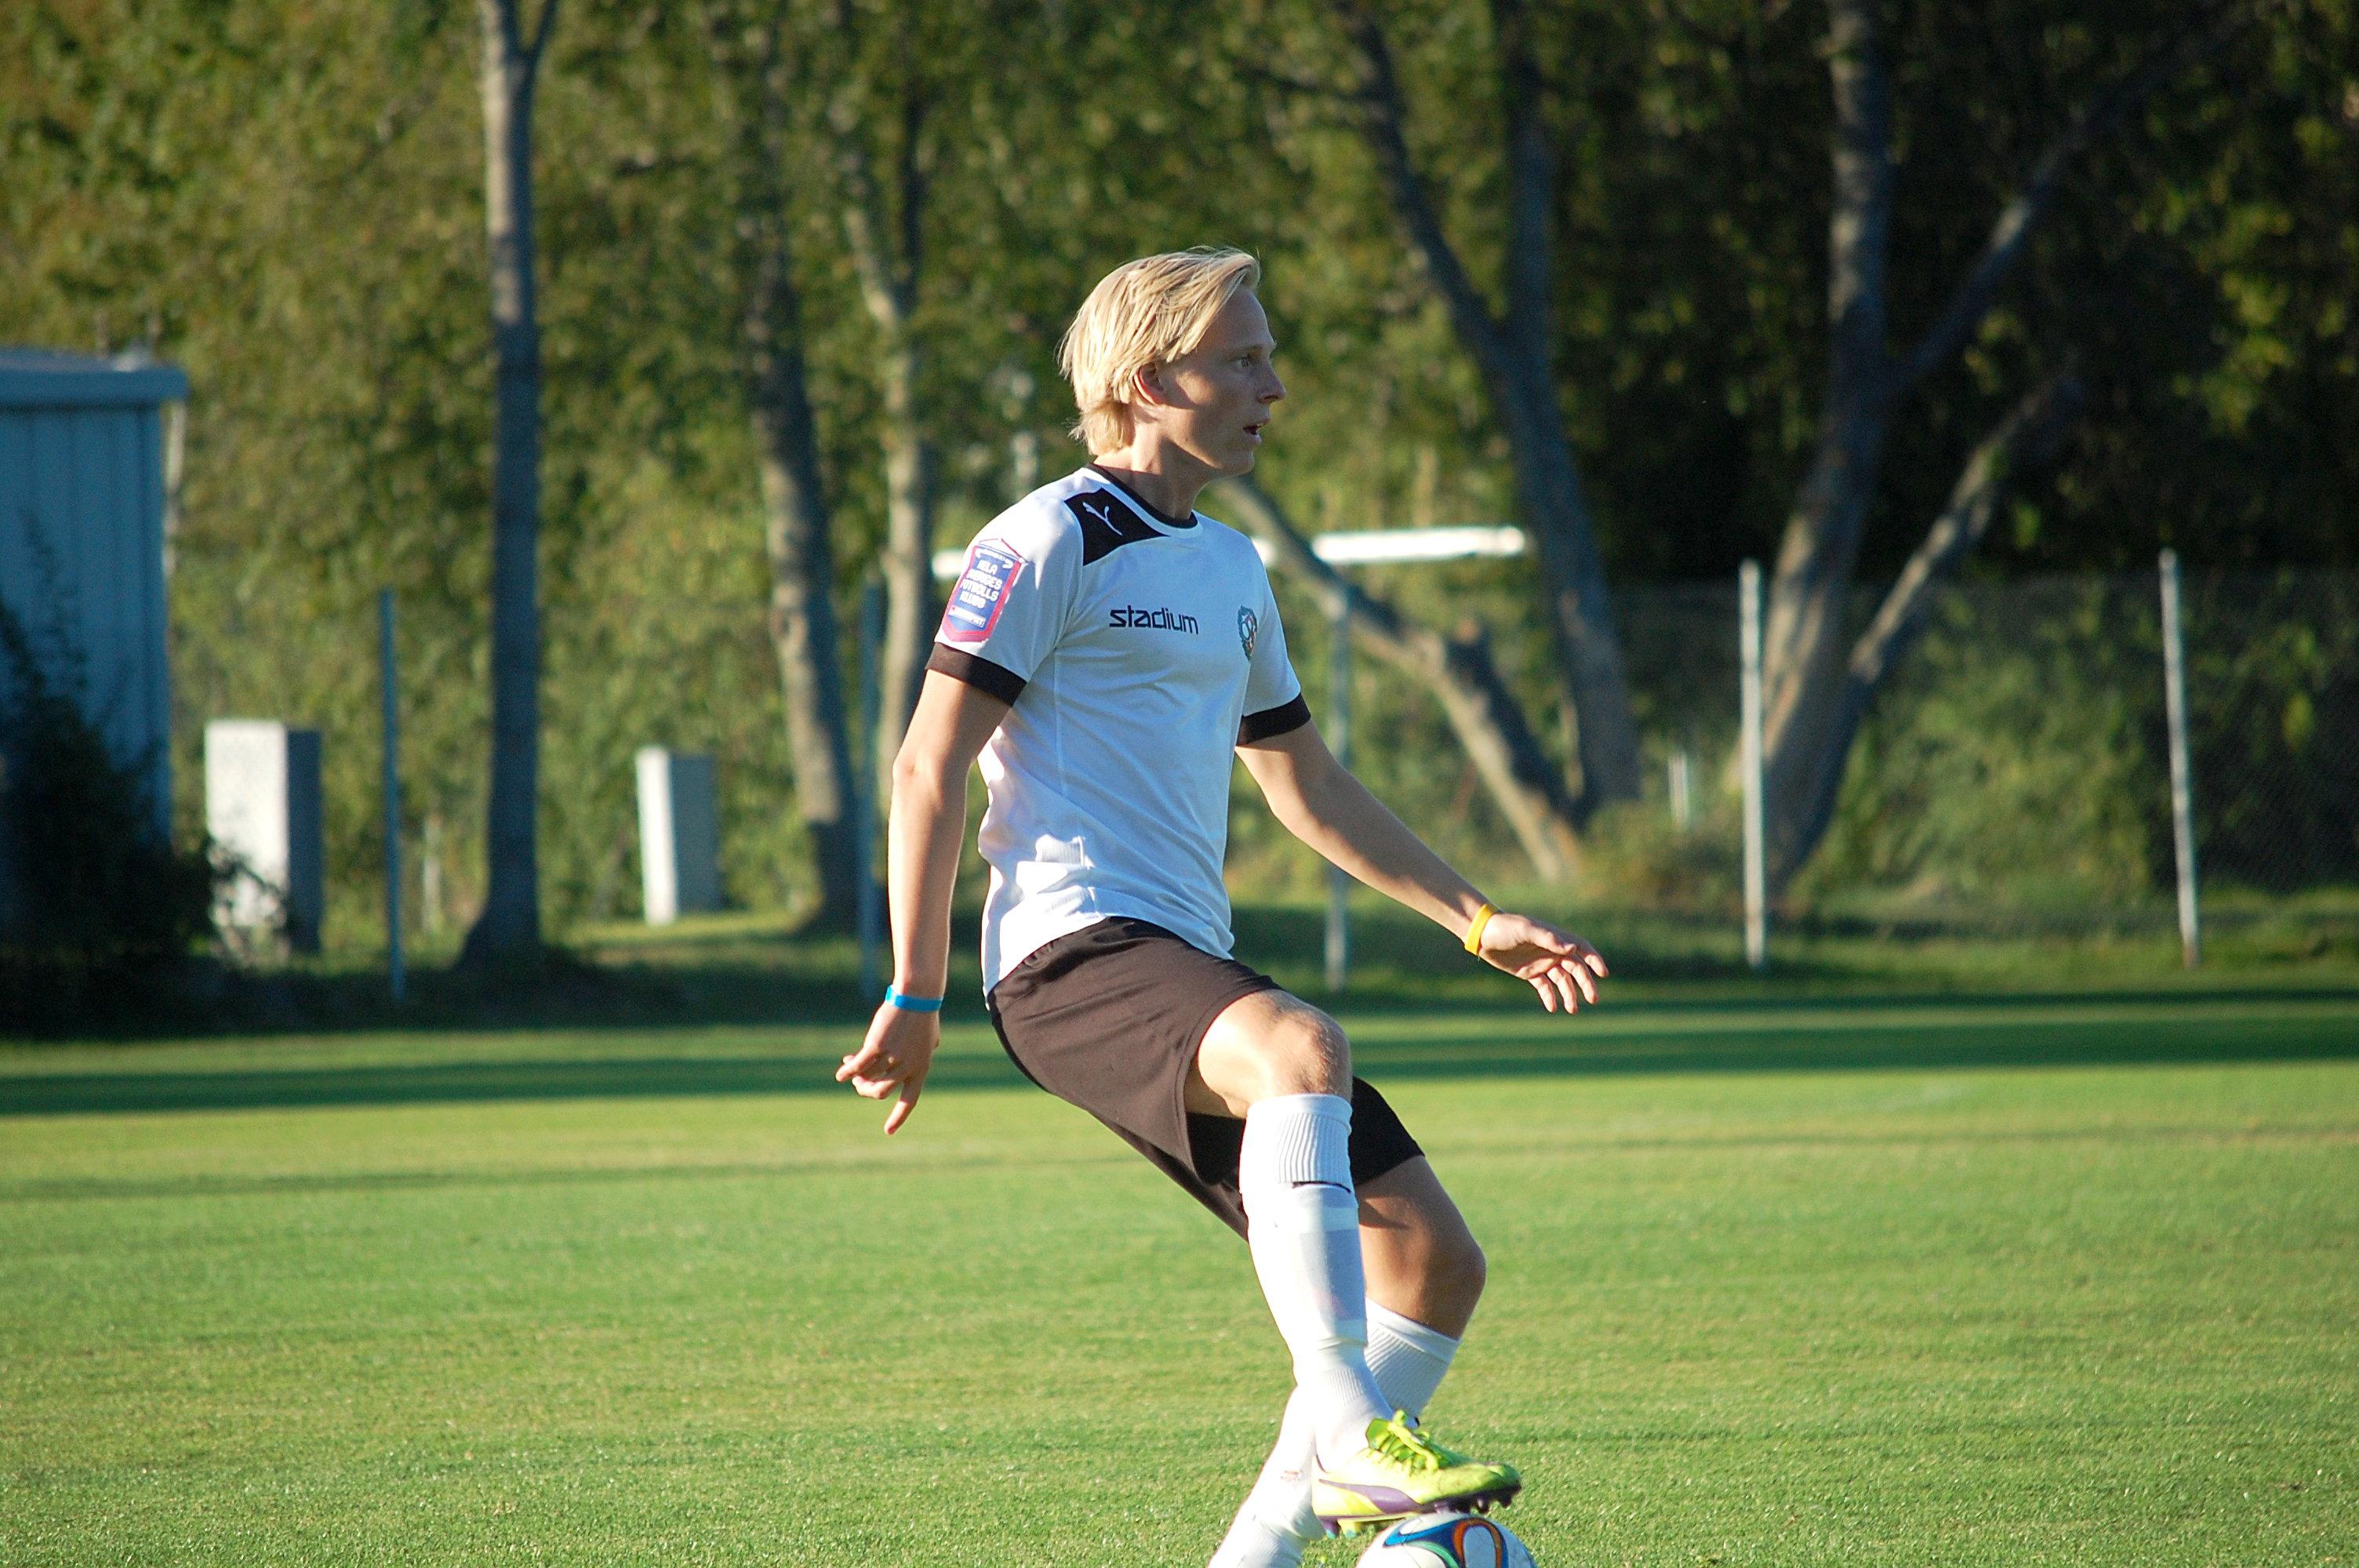 Mikael Loön fick jobba hårt på det centrala mittfältet då ÖSKs juniorer  mötte IK Sturehov i 7701b848ede26